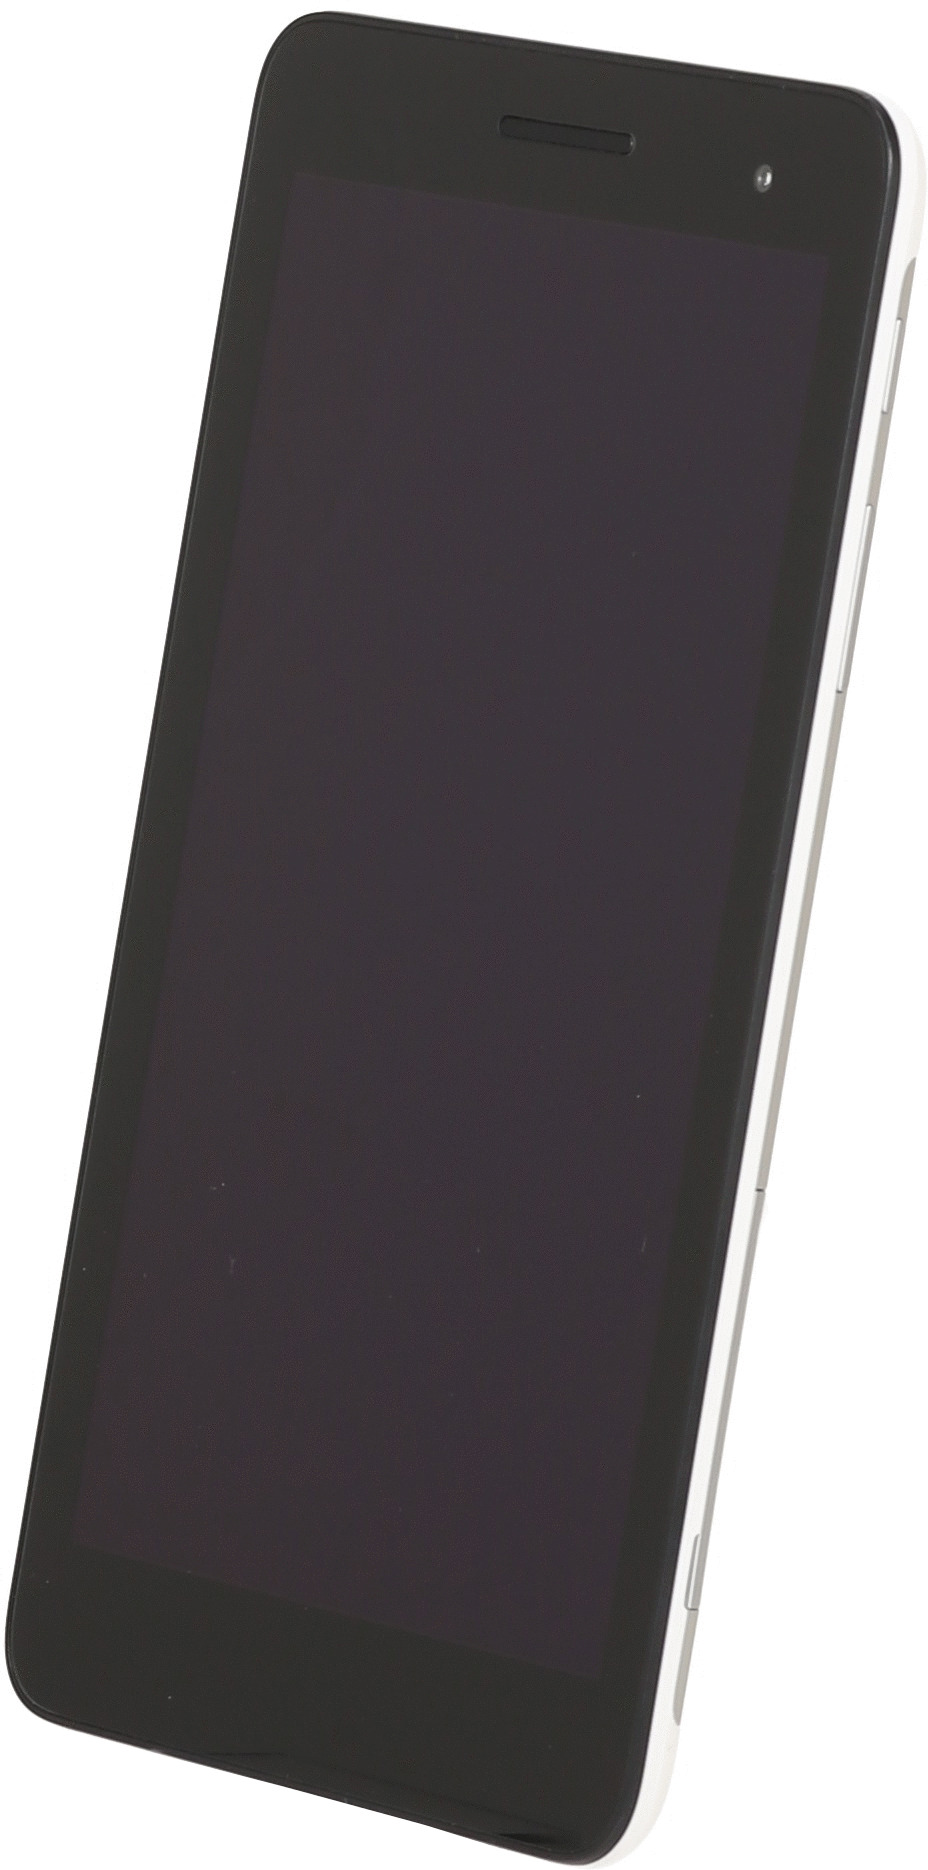 Huawei MediaPad T1 7.0 7 8GB [Wi-Fi] white panel